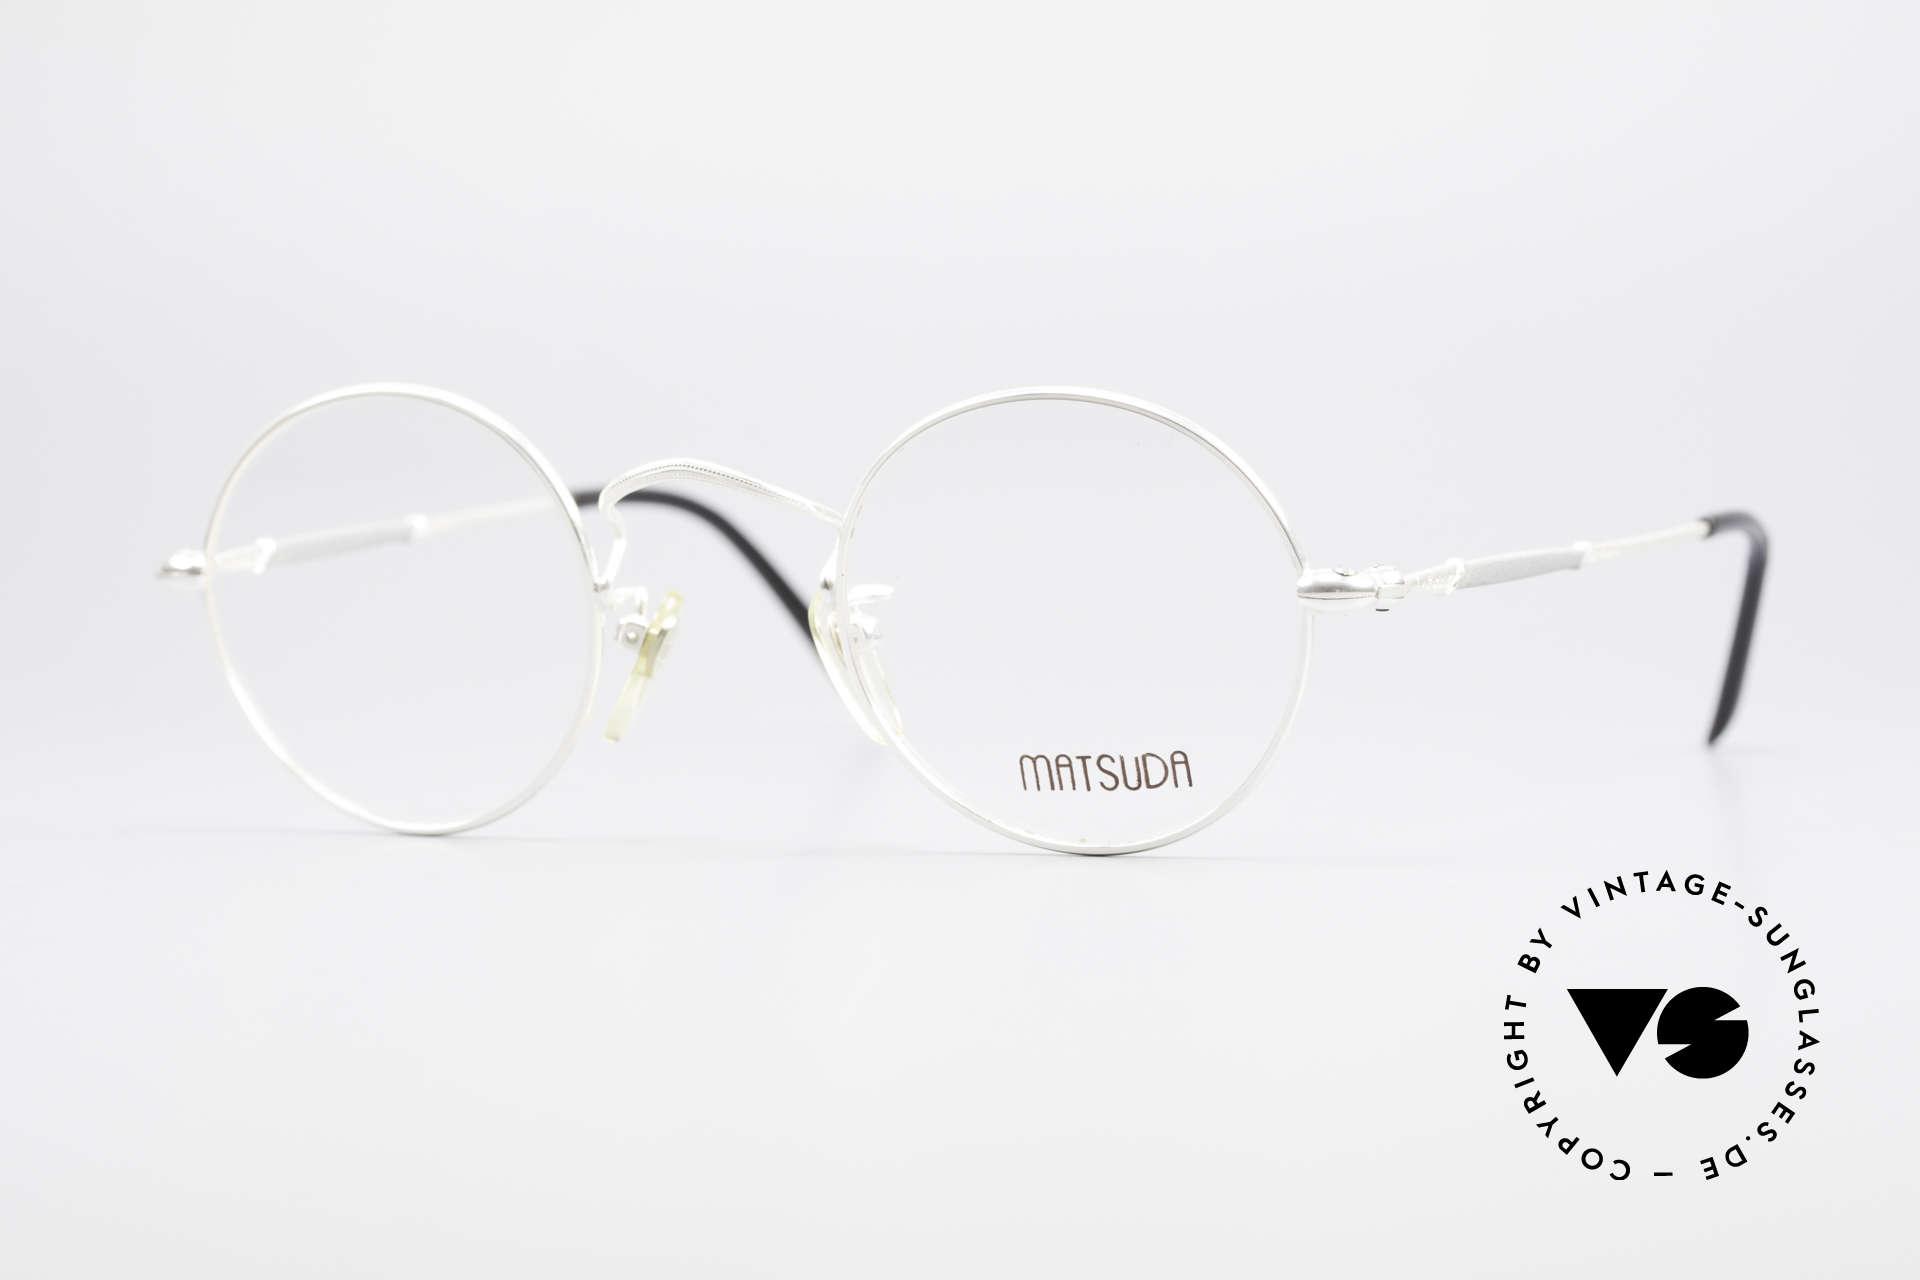 Matsuda 2872 90's Designer Glasses Round, round vintage designer glasses by Matsuda from the 90's, Made for Men and Women